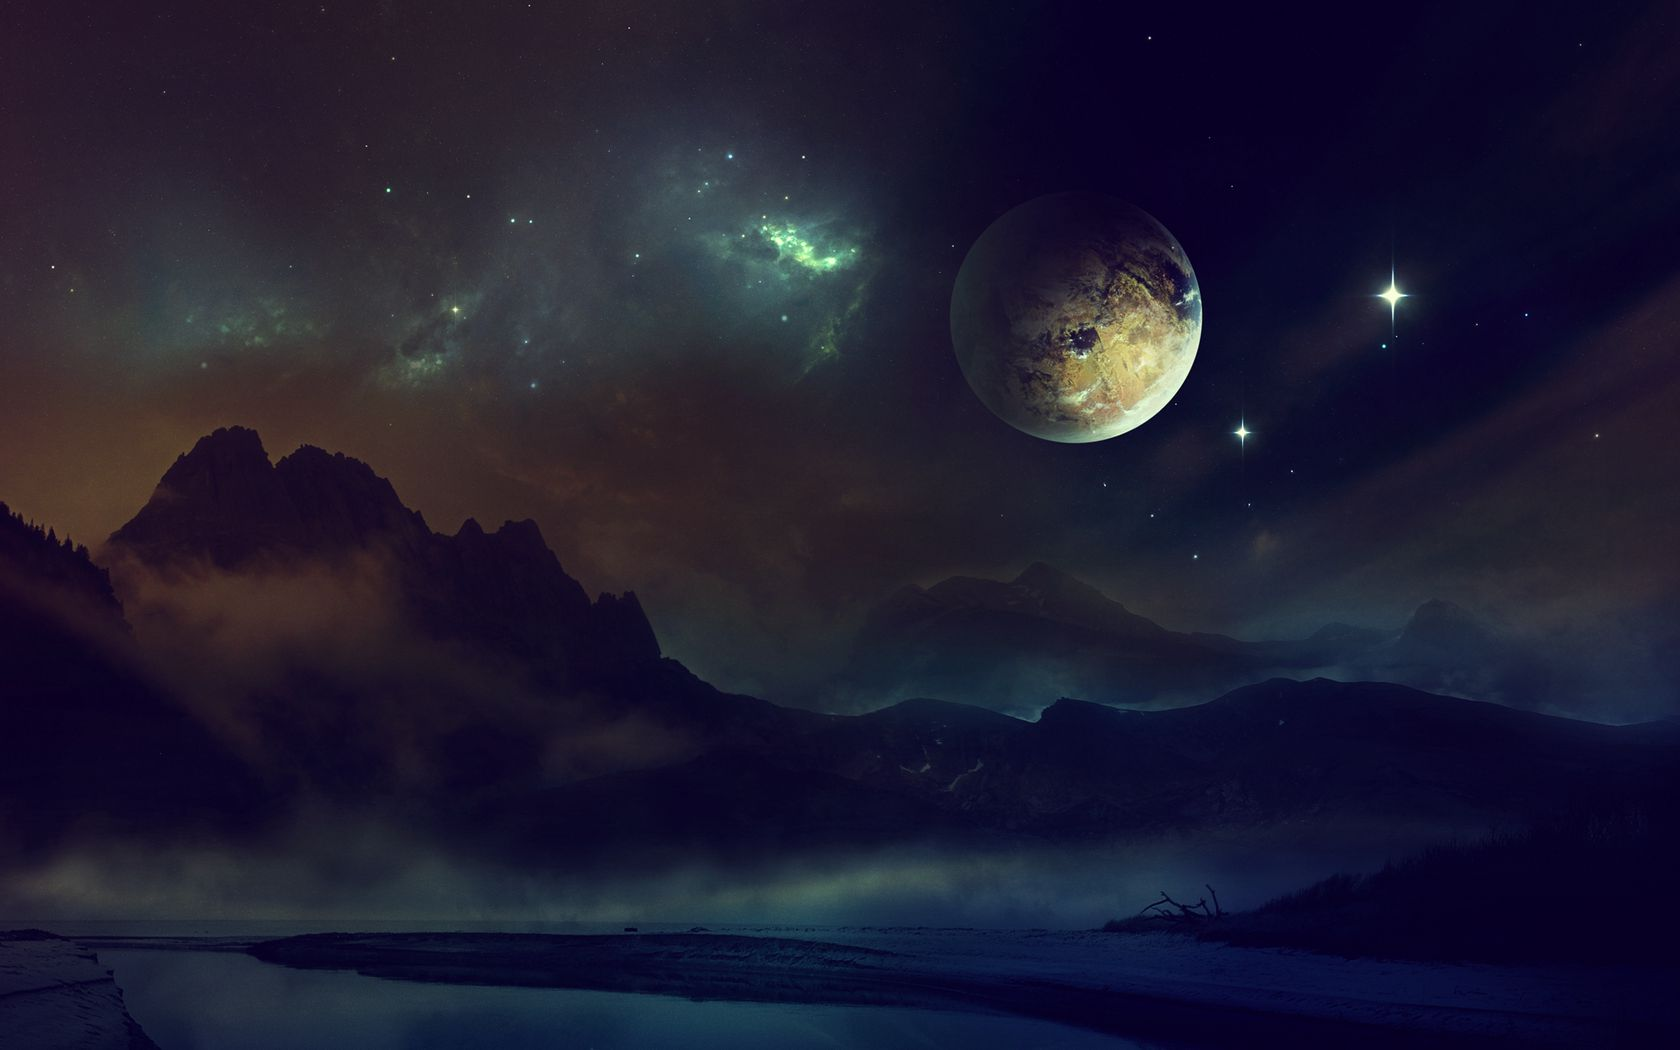 1680x1050 Wallpaper space, planet, light, night, sky